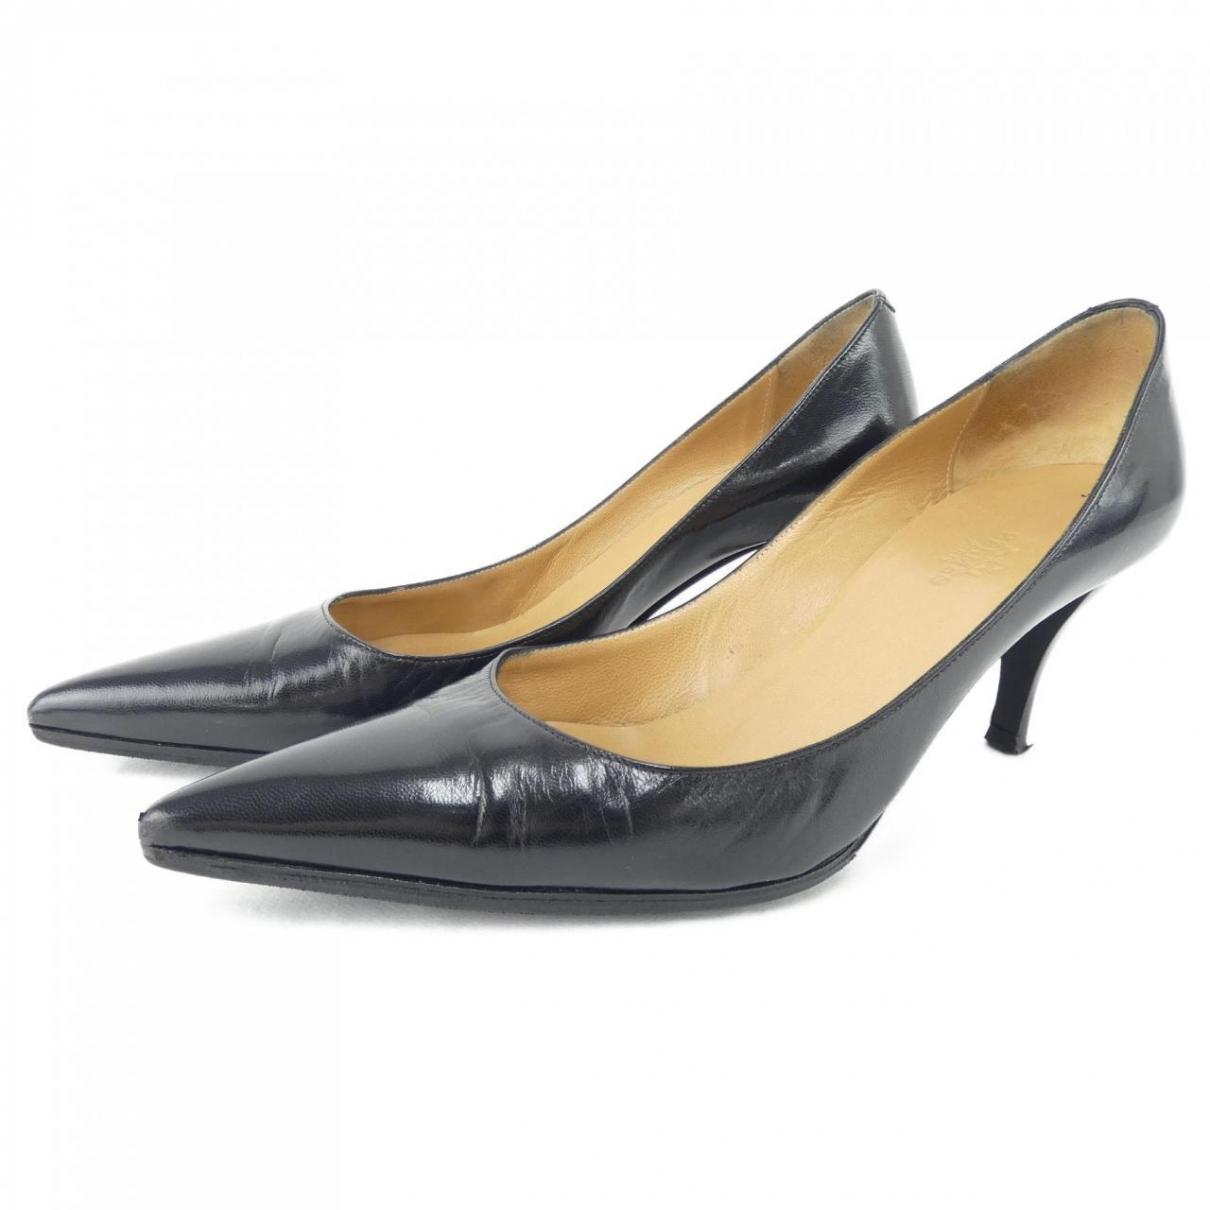 Hermès \N Black Leather Heels for Women 34 EU